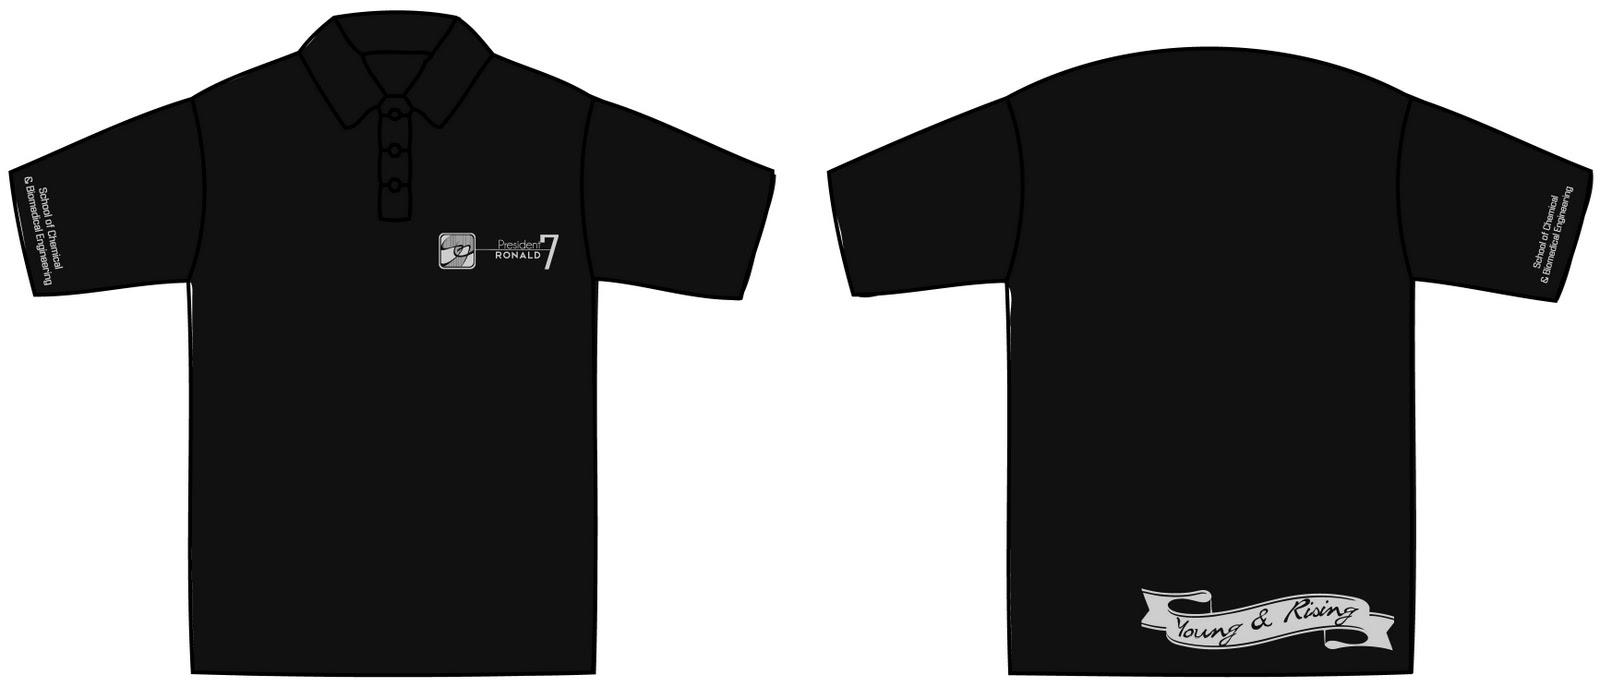 Scbe publicity blog maincomm polo shirt part 2 re for Two color shirt design